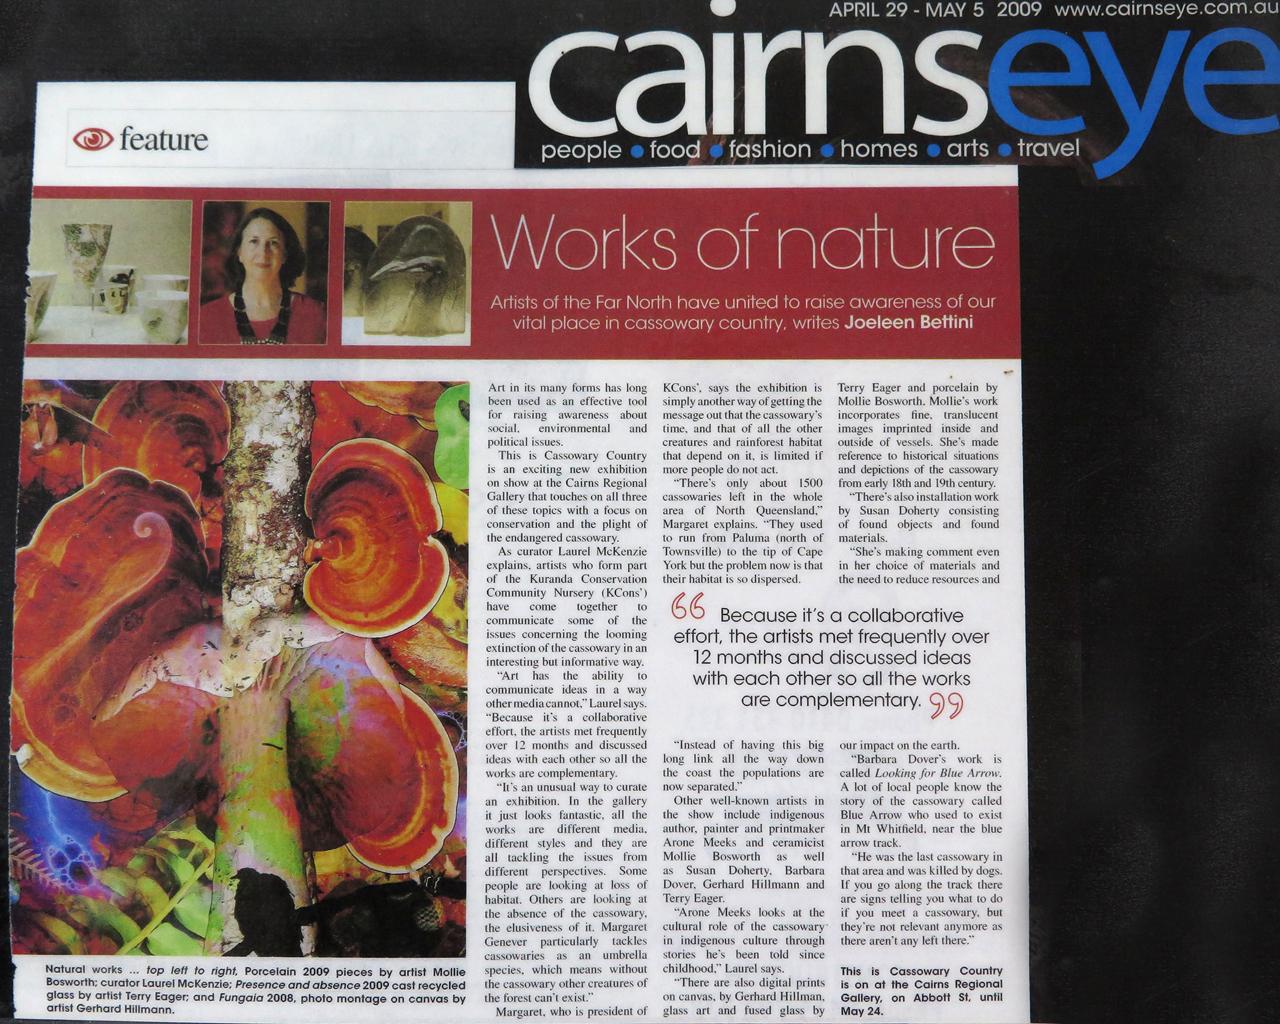 Cairns eye magazine